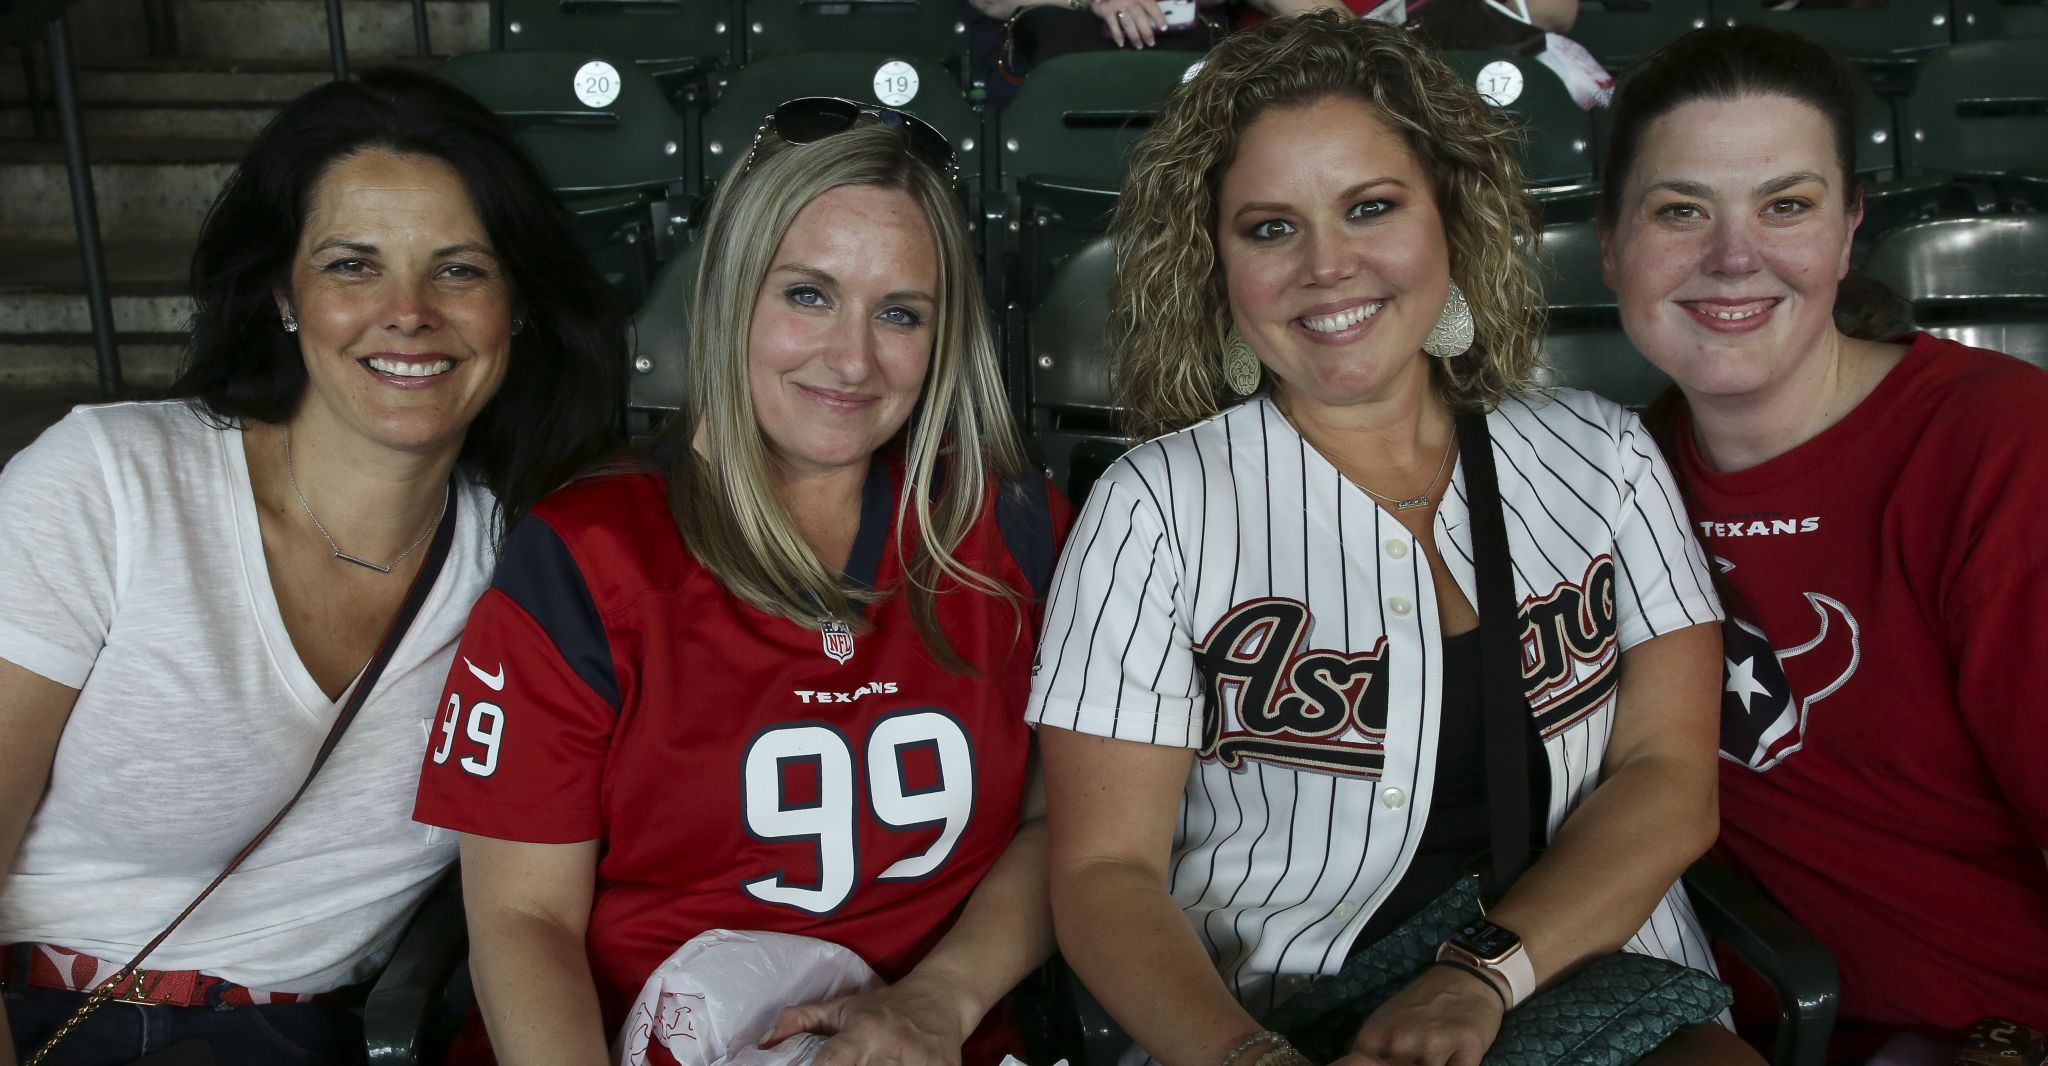 Fans flock to J.J. Watt's charity softball game